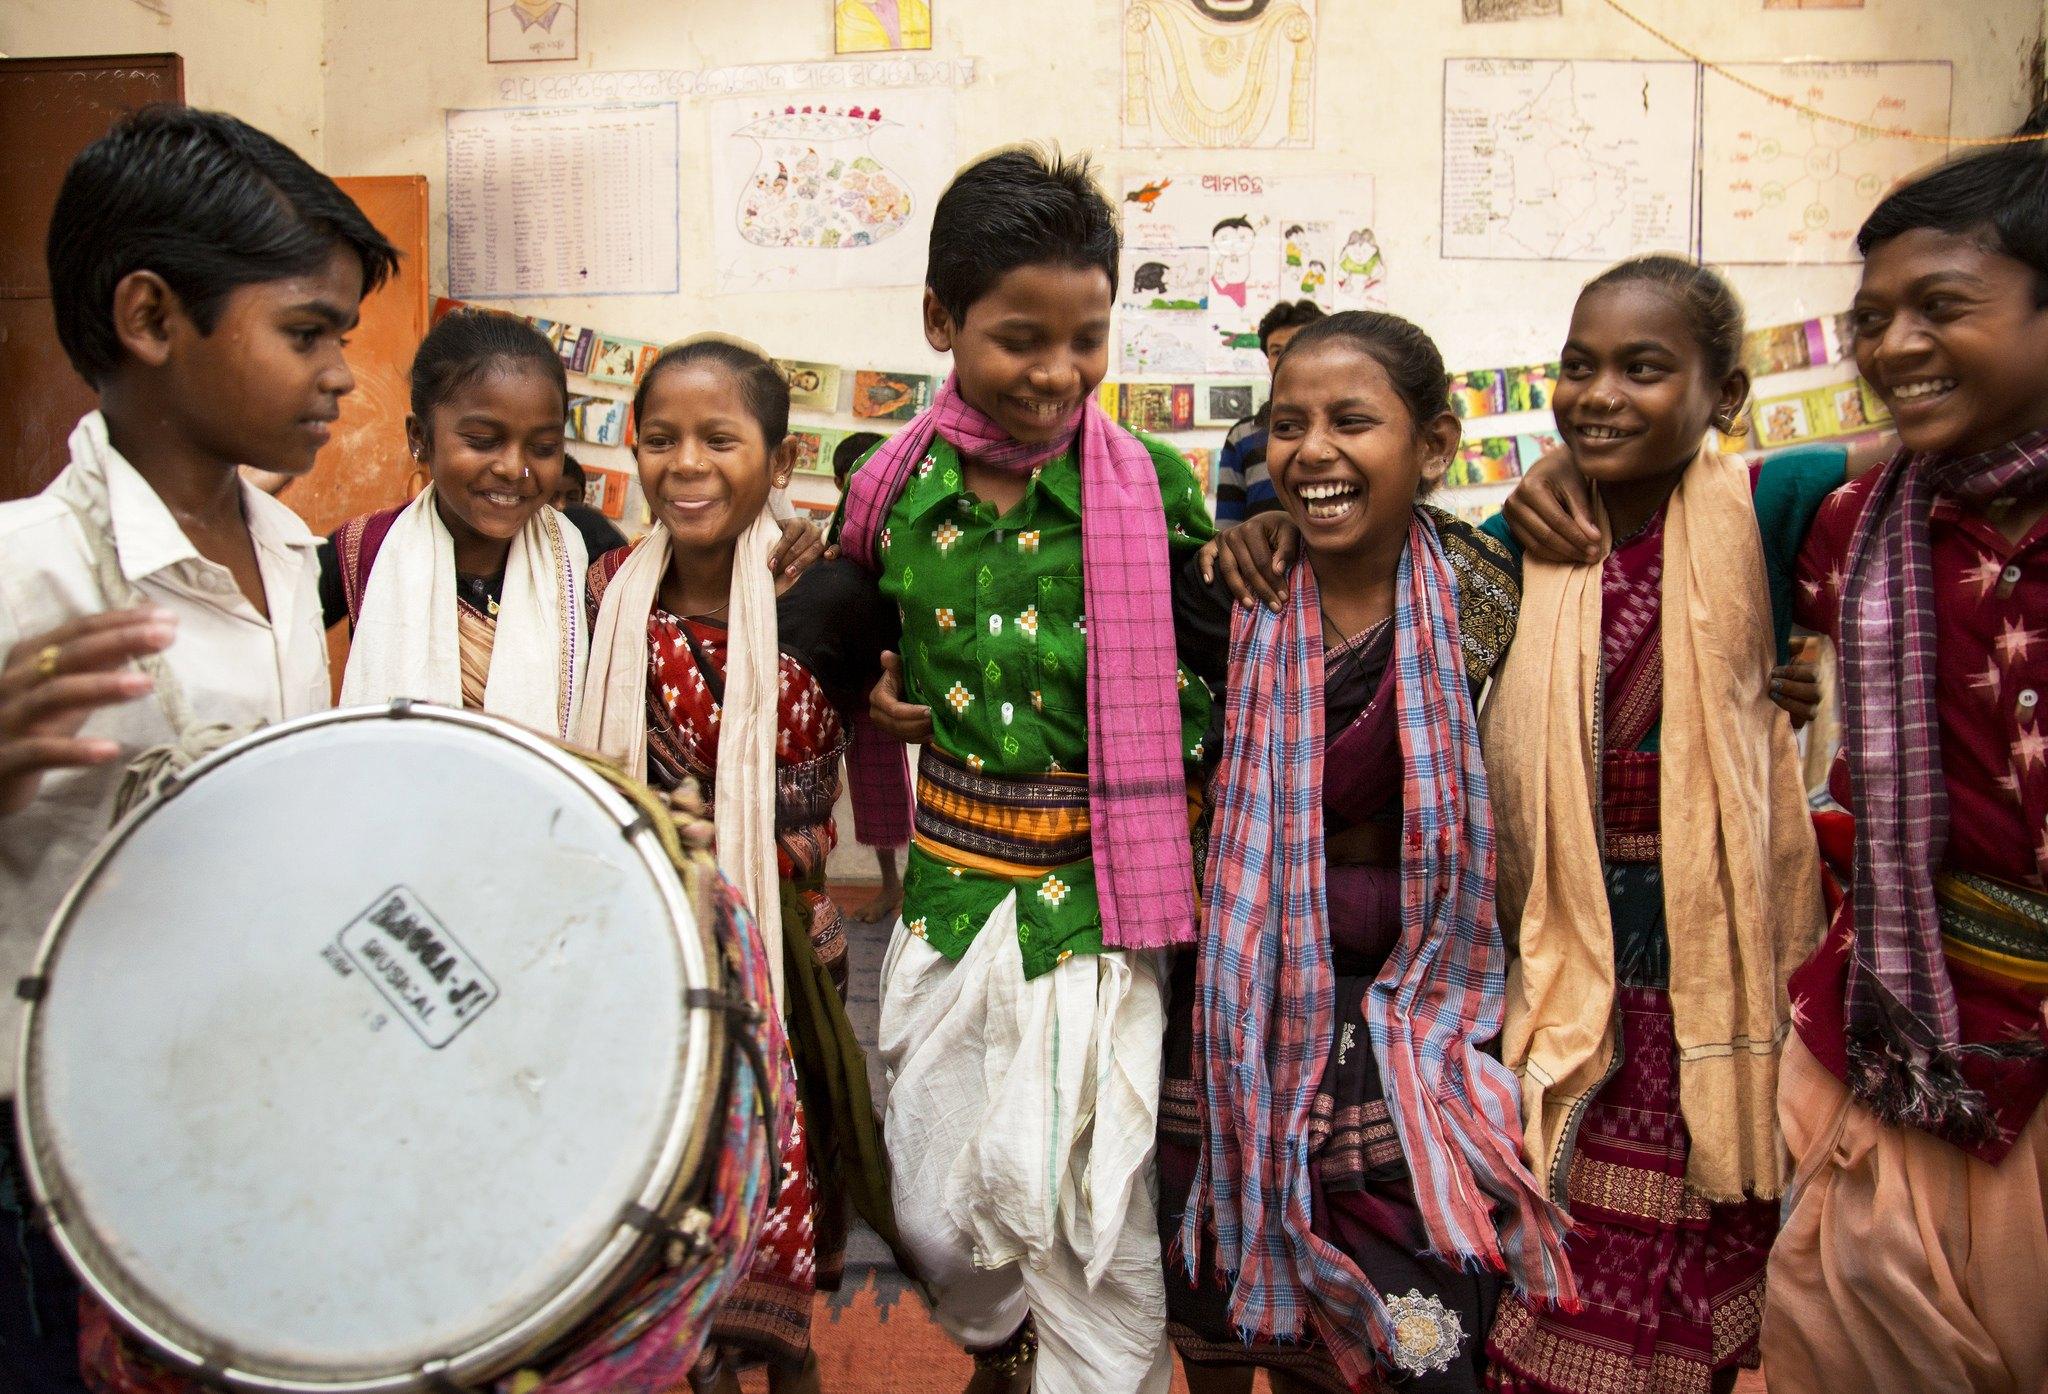 American India Foundation - LAMP